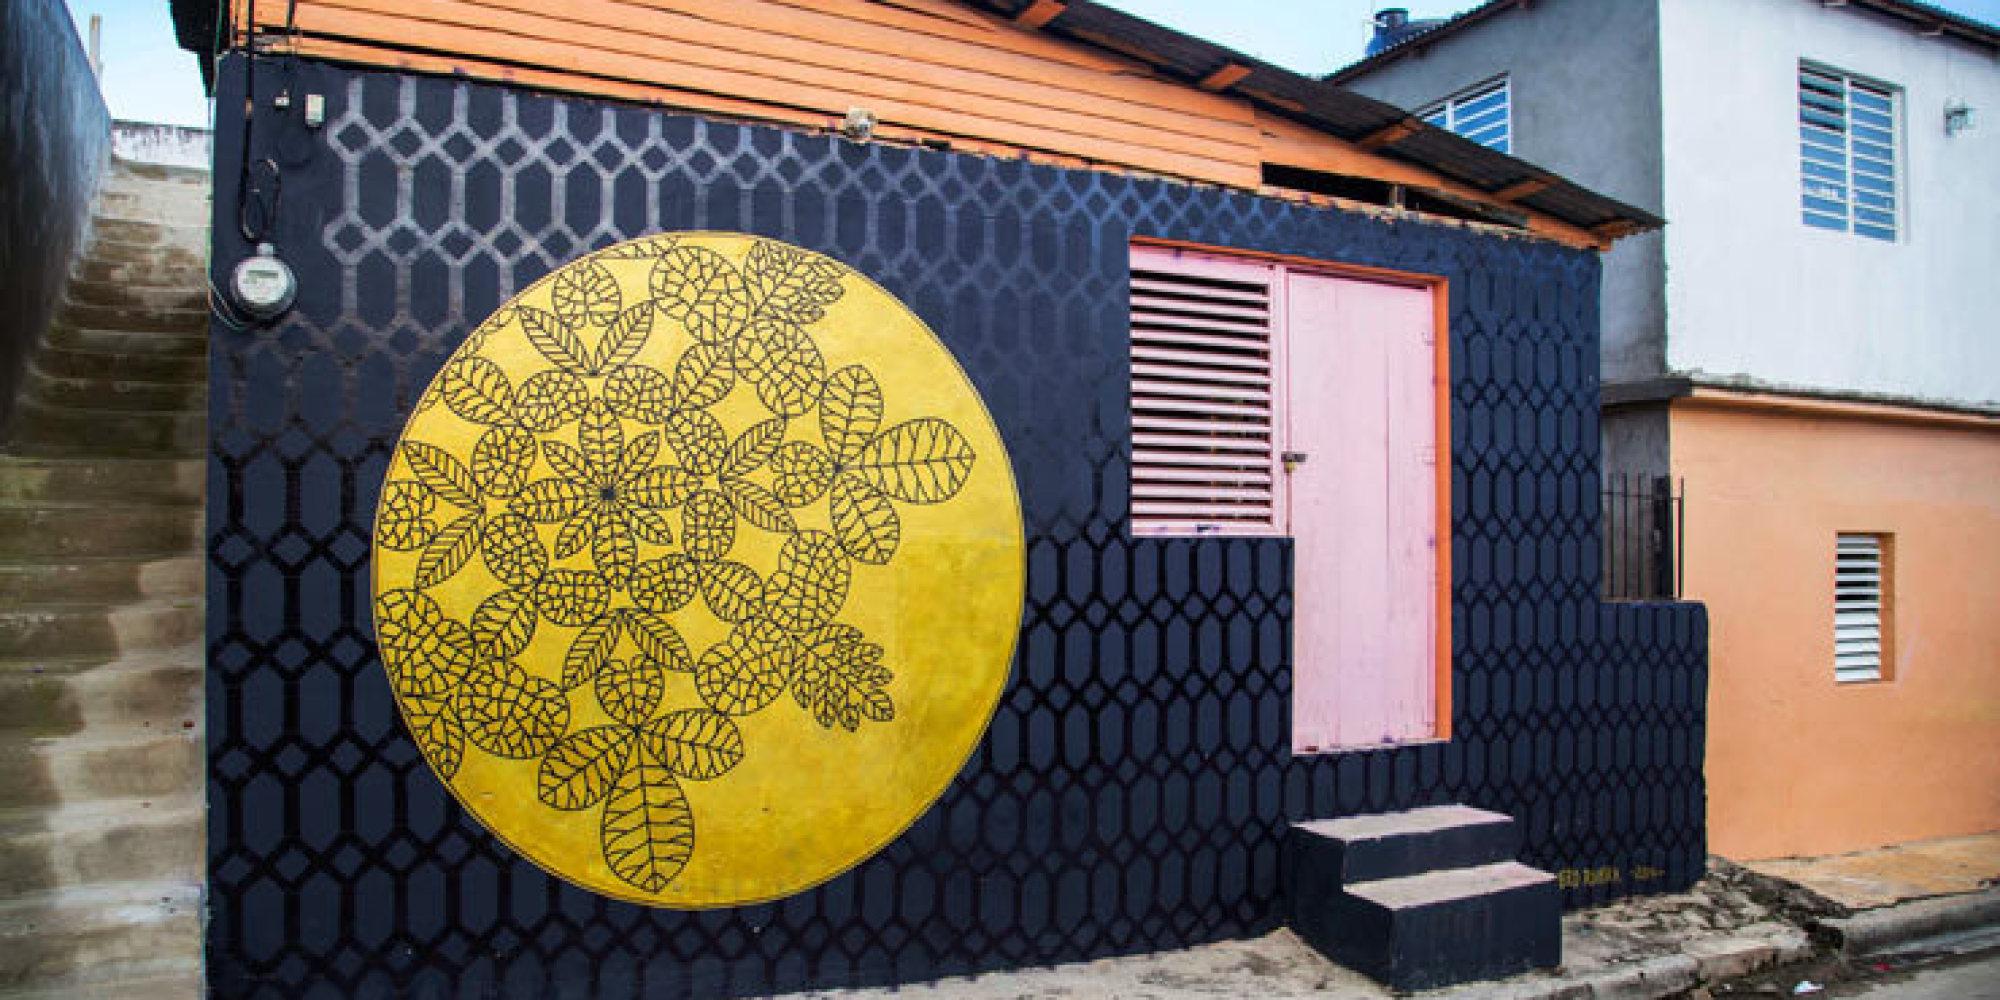 Street Art Sancocho: ArteSano Project Brings Dominican Flavor | HuffPost